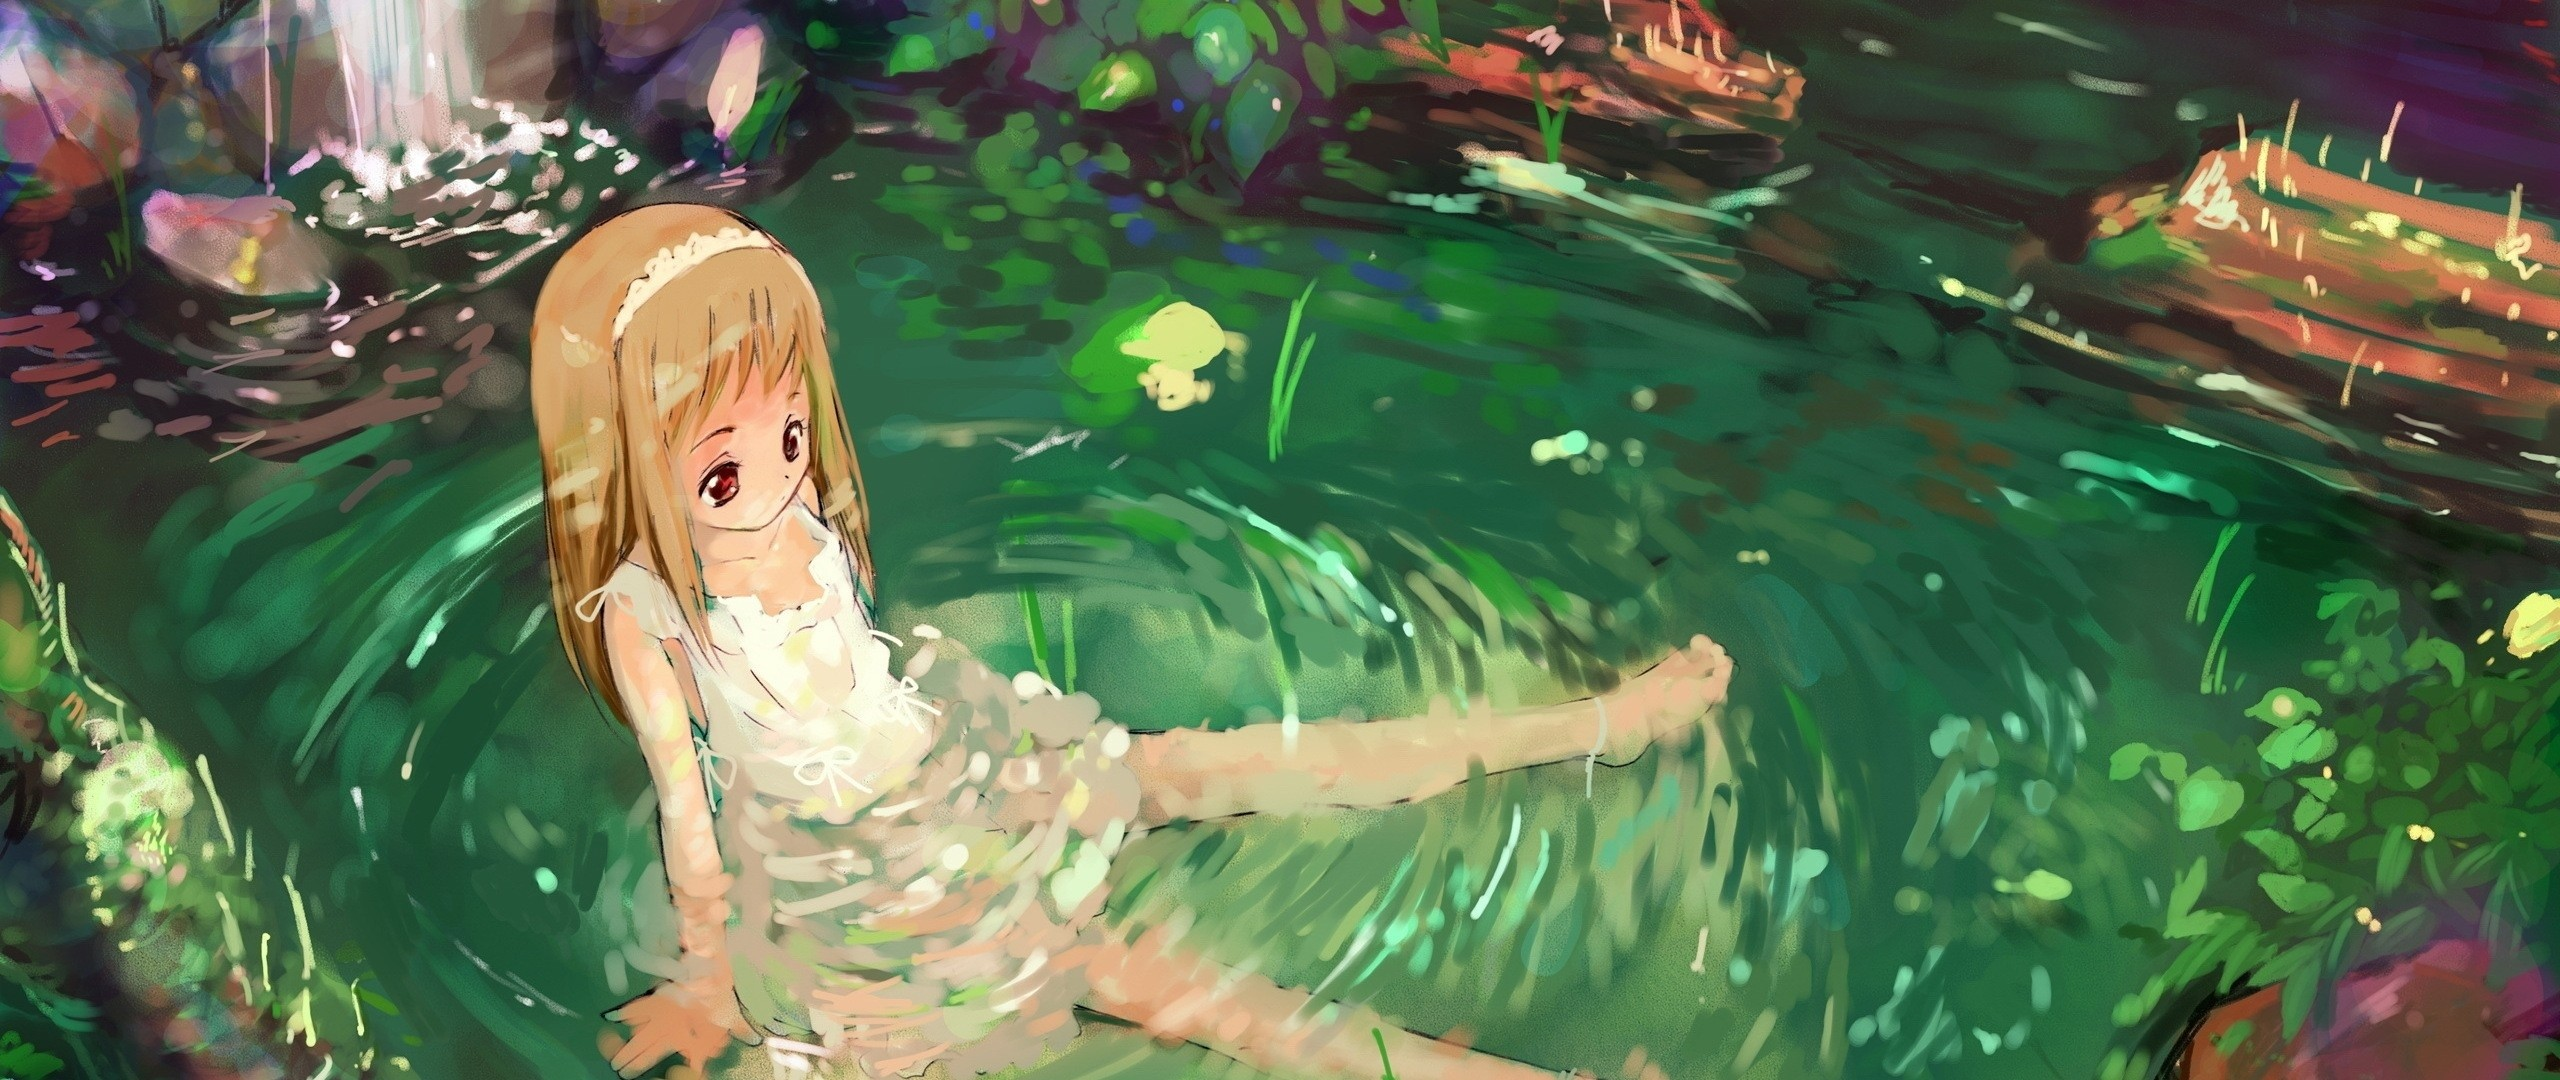 Wallpaper anime, girl, nature, water, sadness